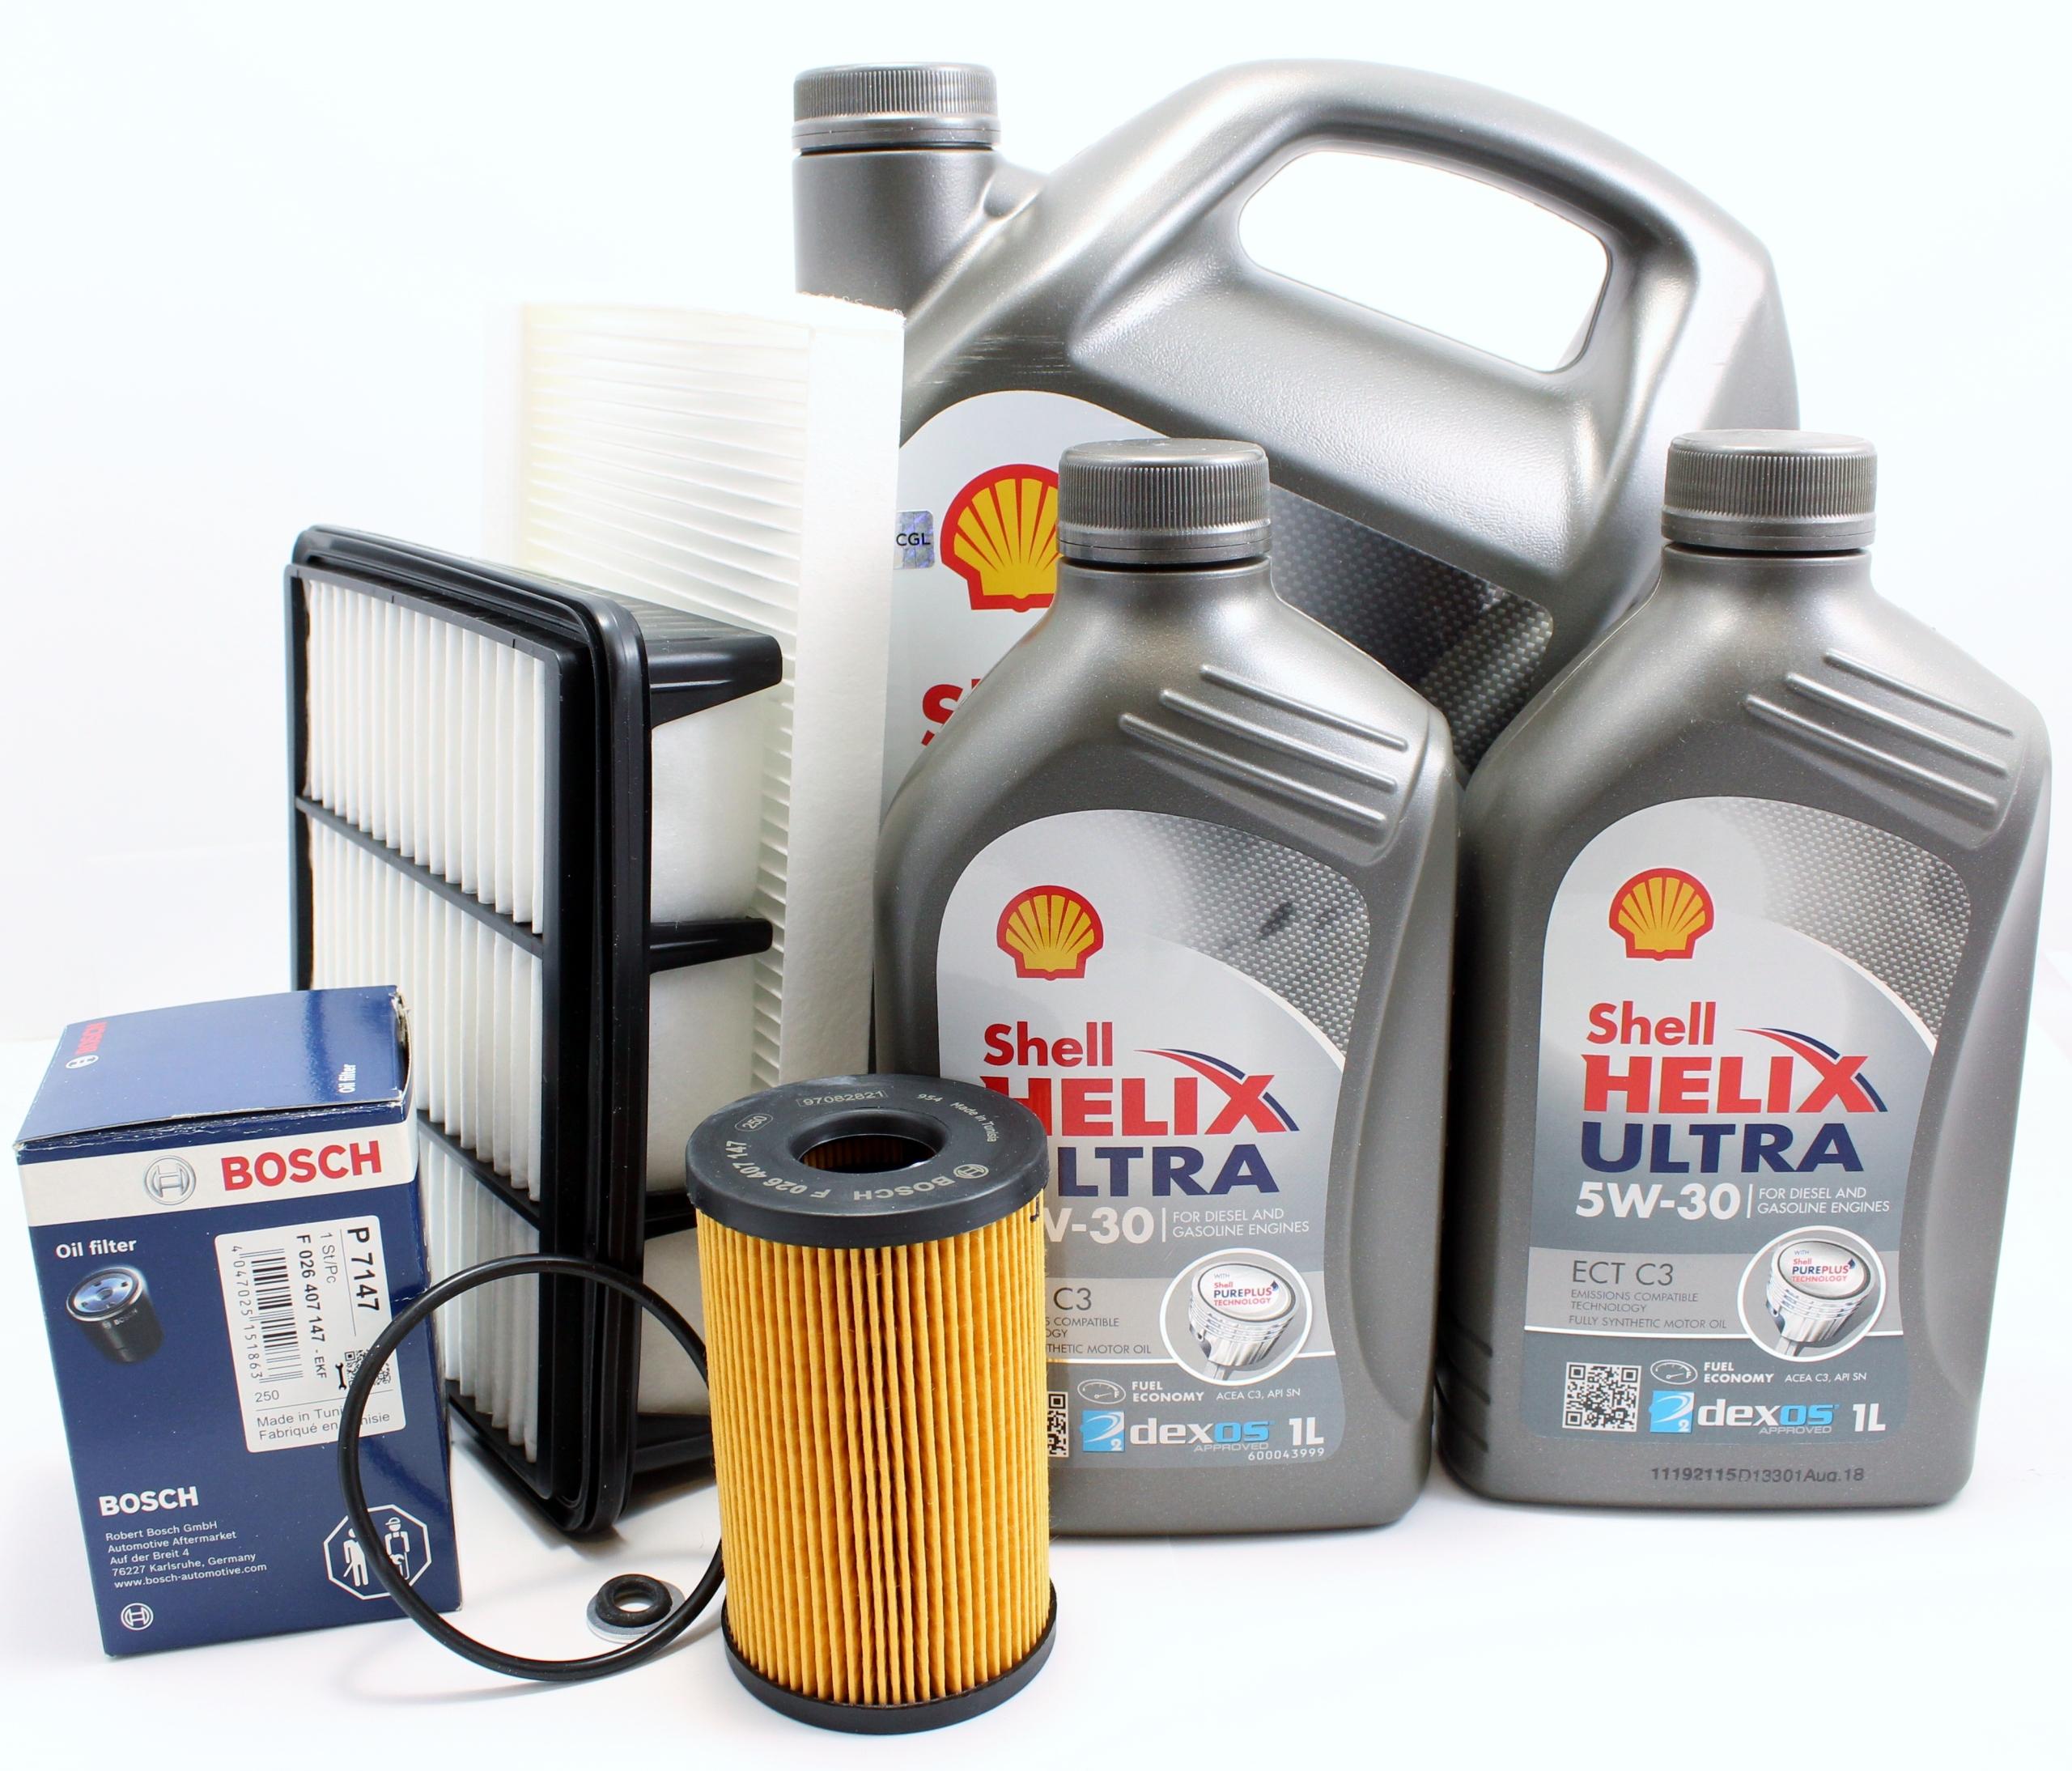 комплект filtrÓw+olej kia ceed hundai i30 16crdi